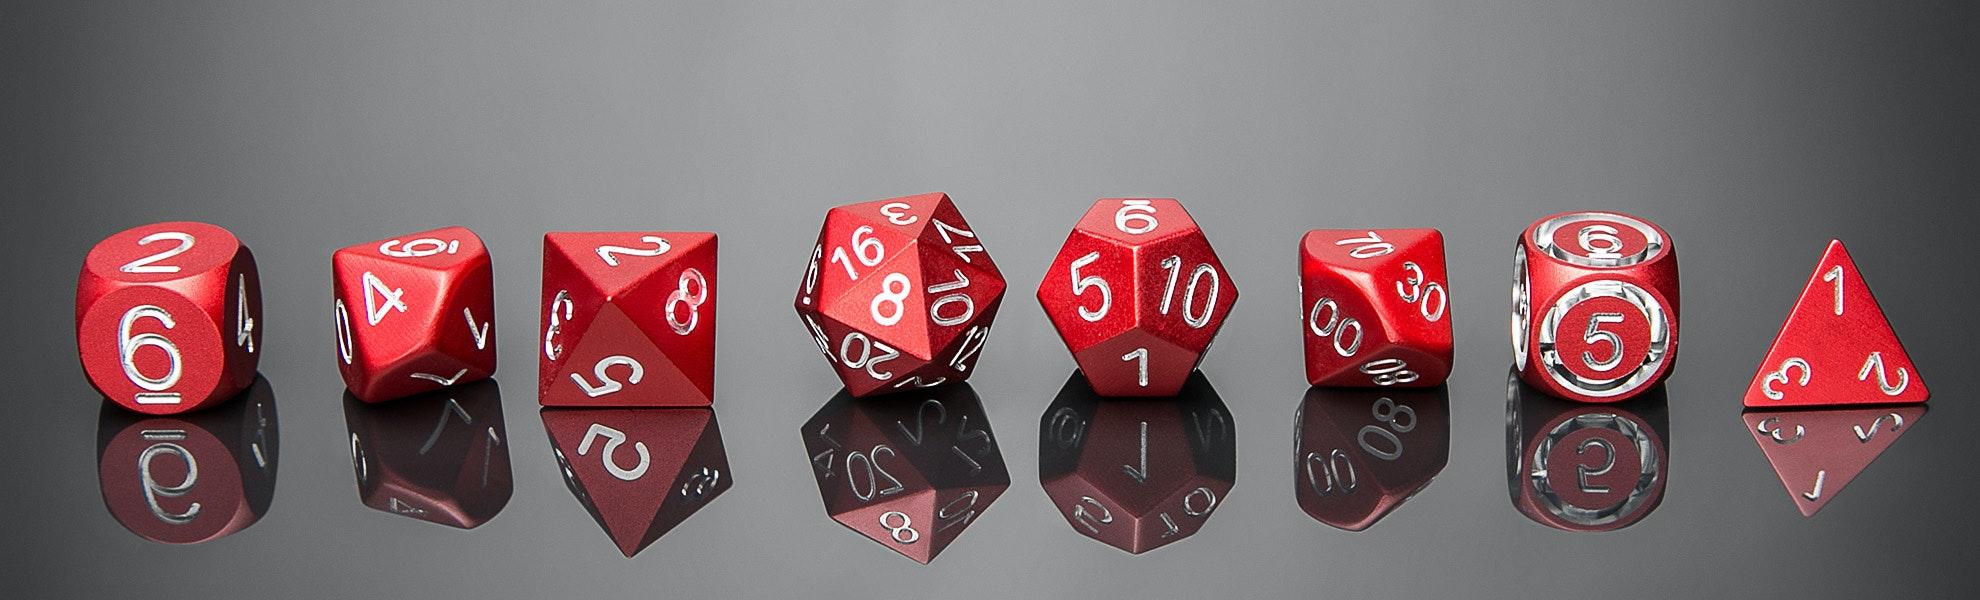 Precision Metal Polyhedral Dice Set